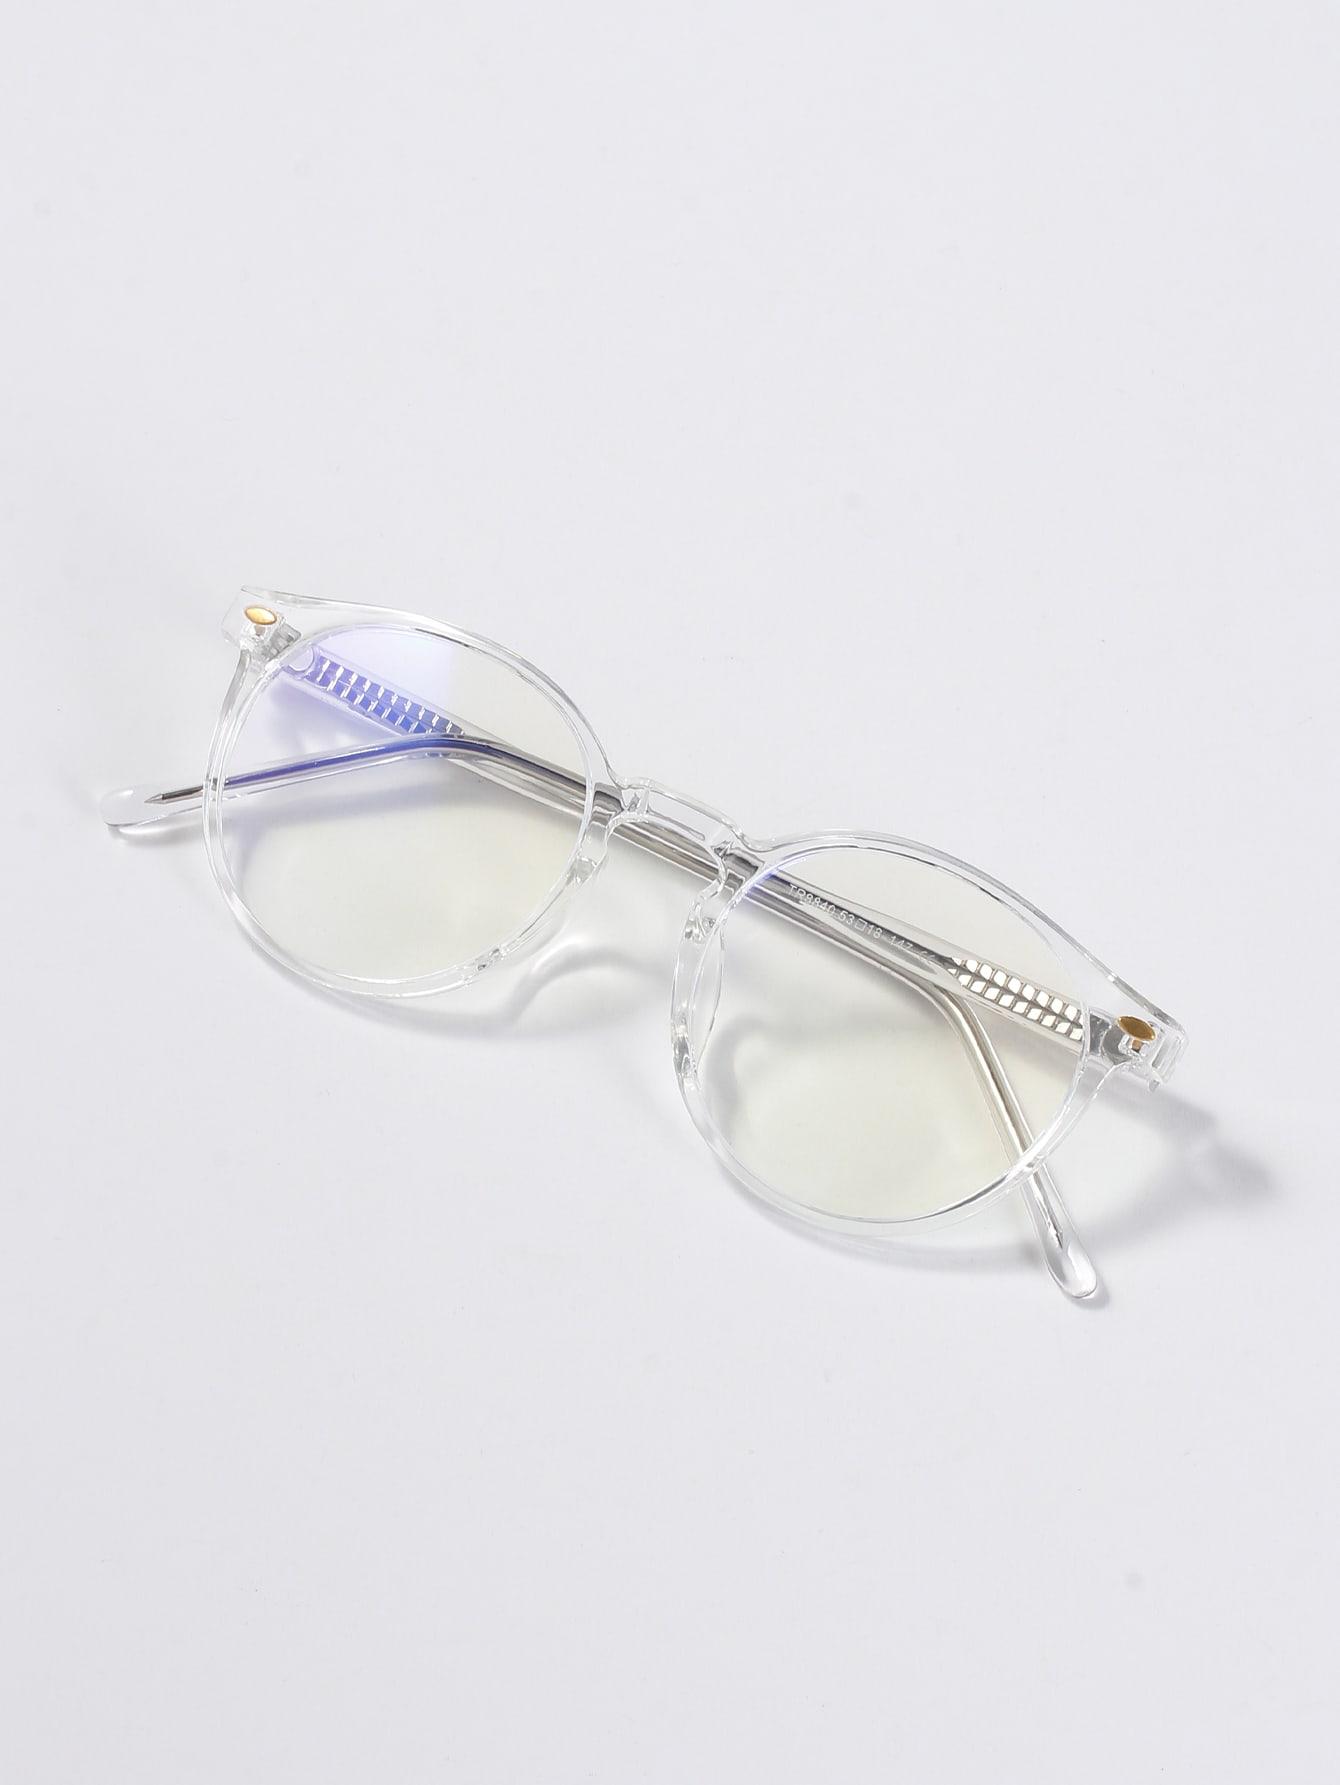 Studded Decor Acrylic Frame Glasses thumbnail